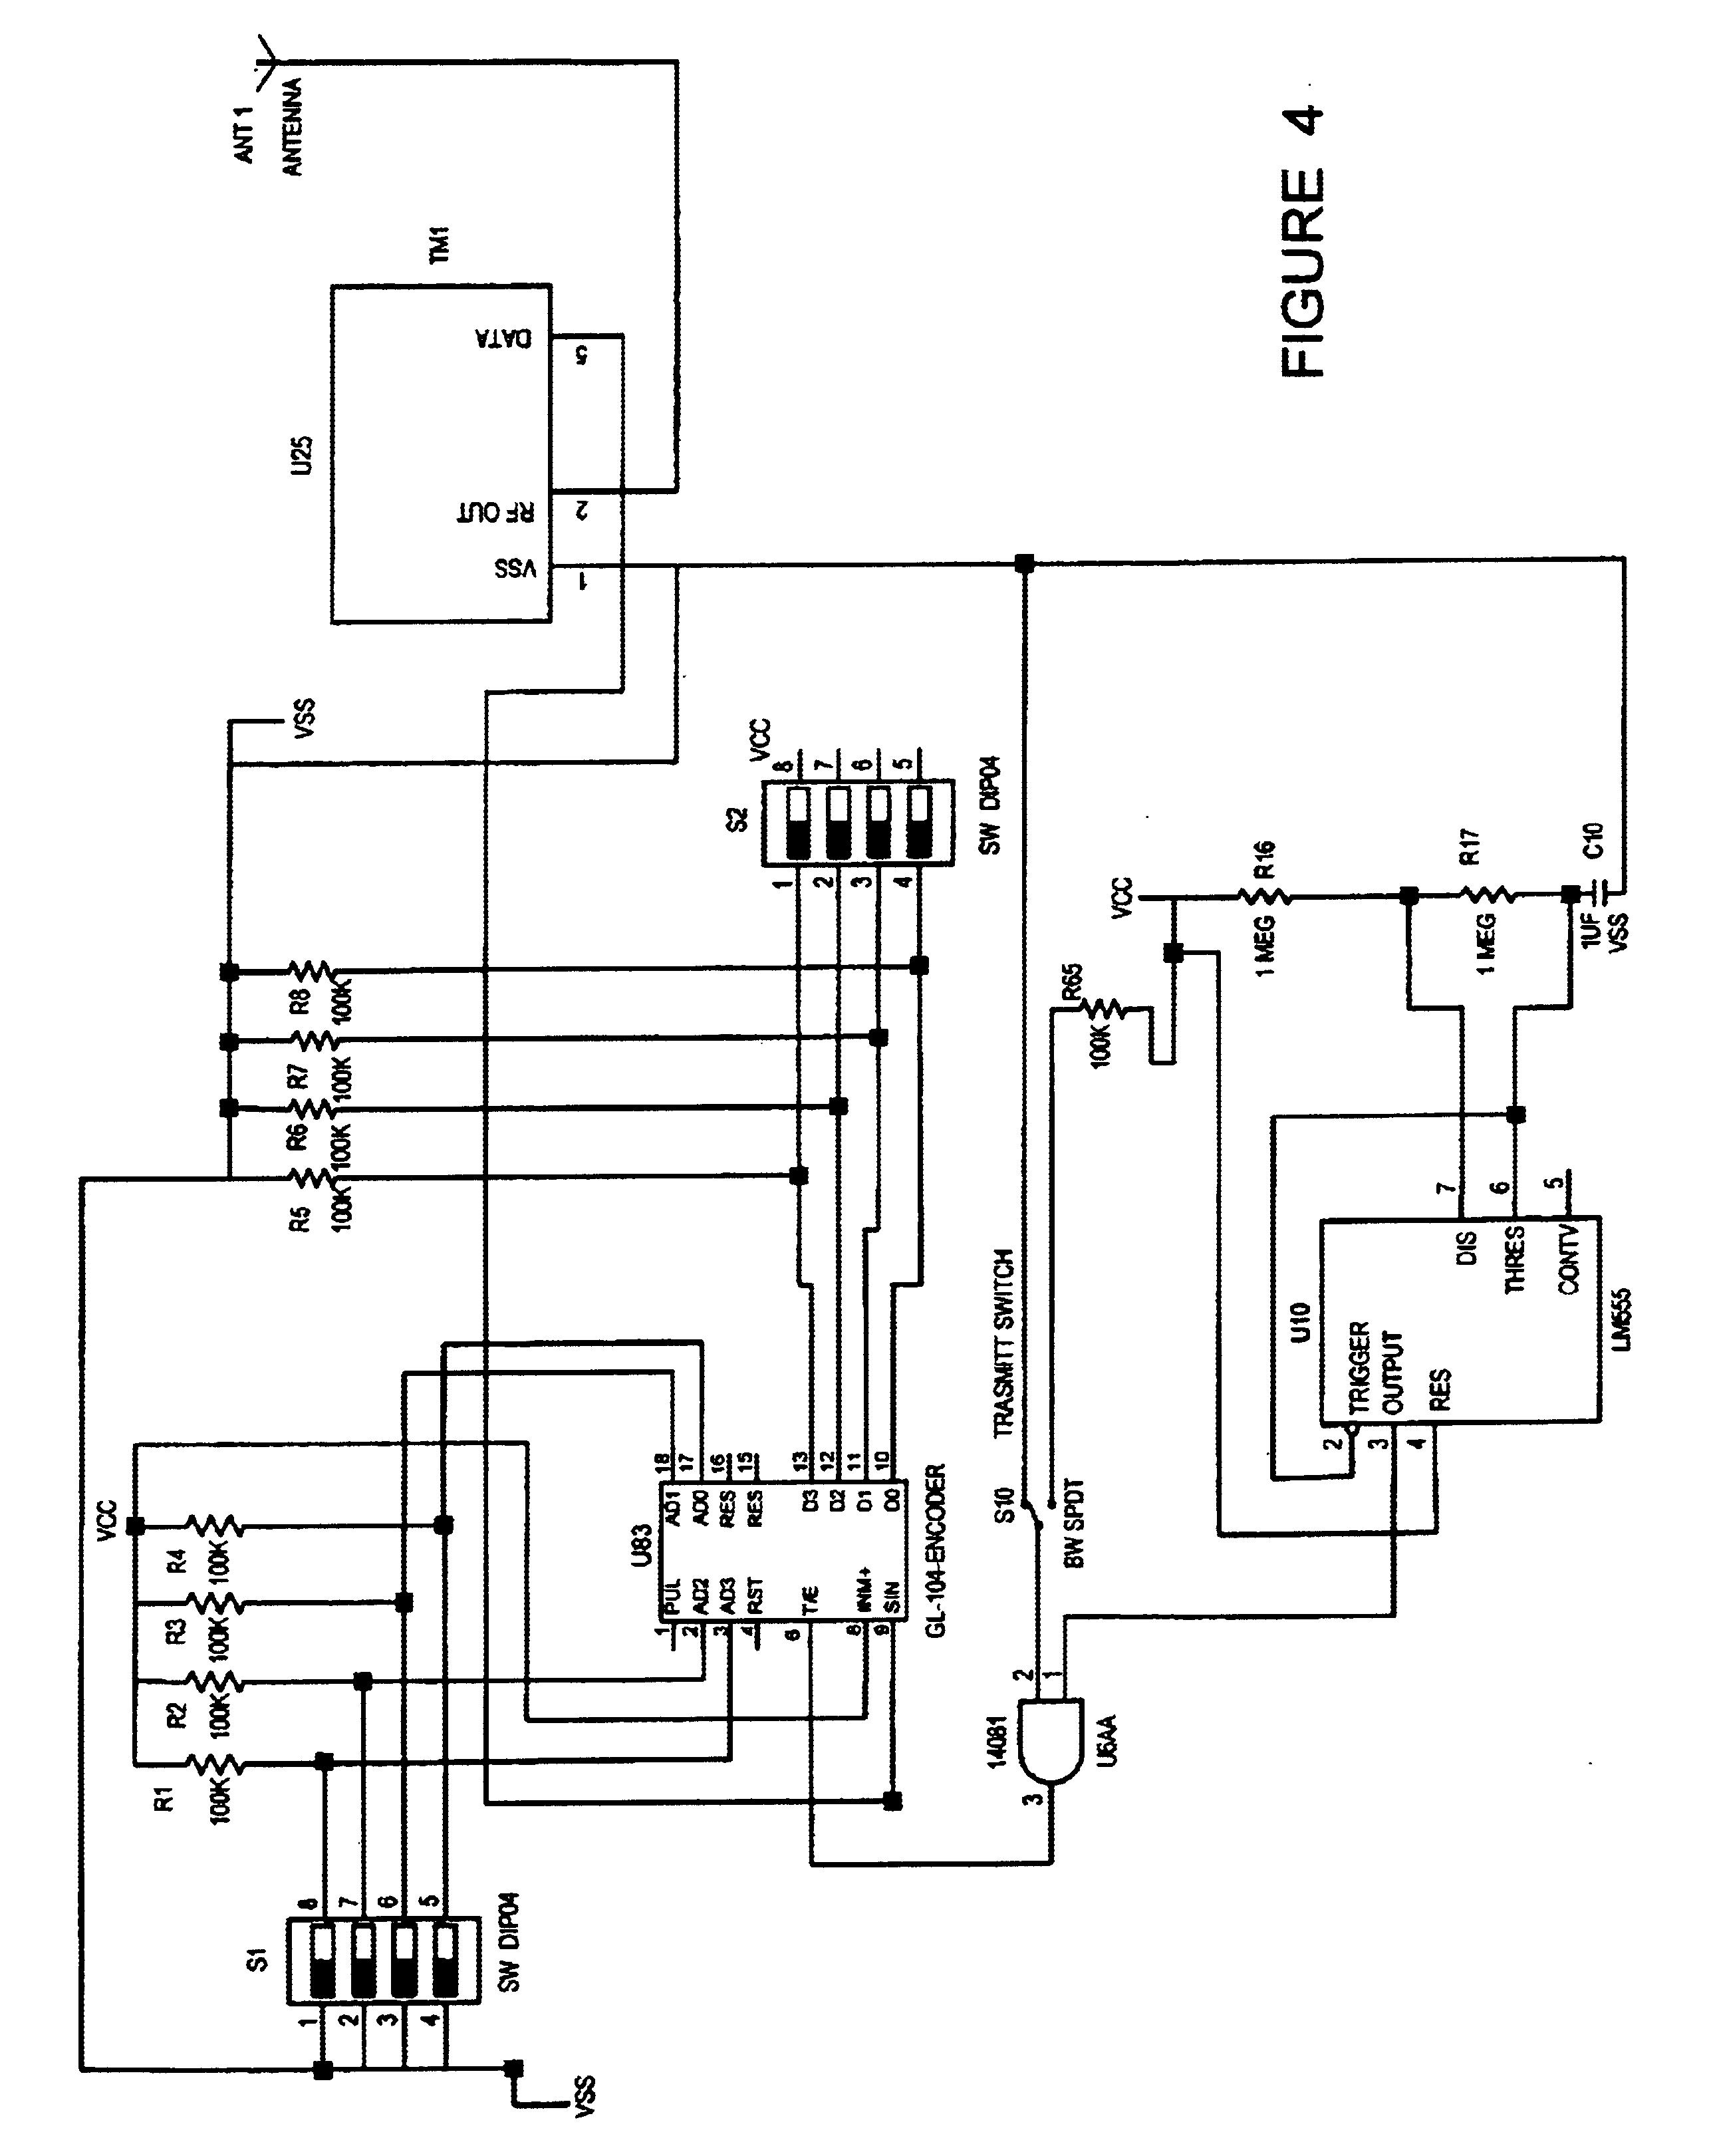 Tm1 alarm wiring diagram wikishare us06836221 20041228 d00004 tm1 alarm wiring diagram